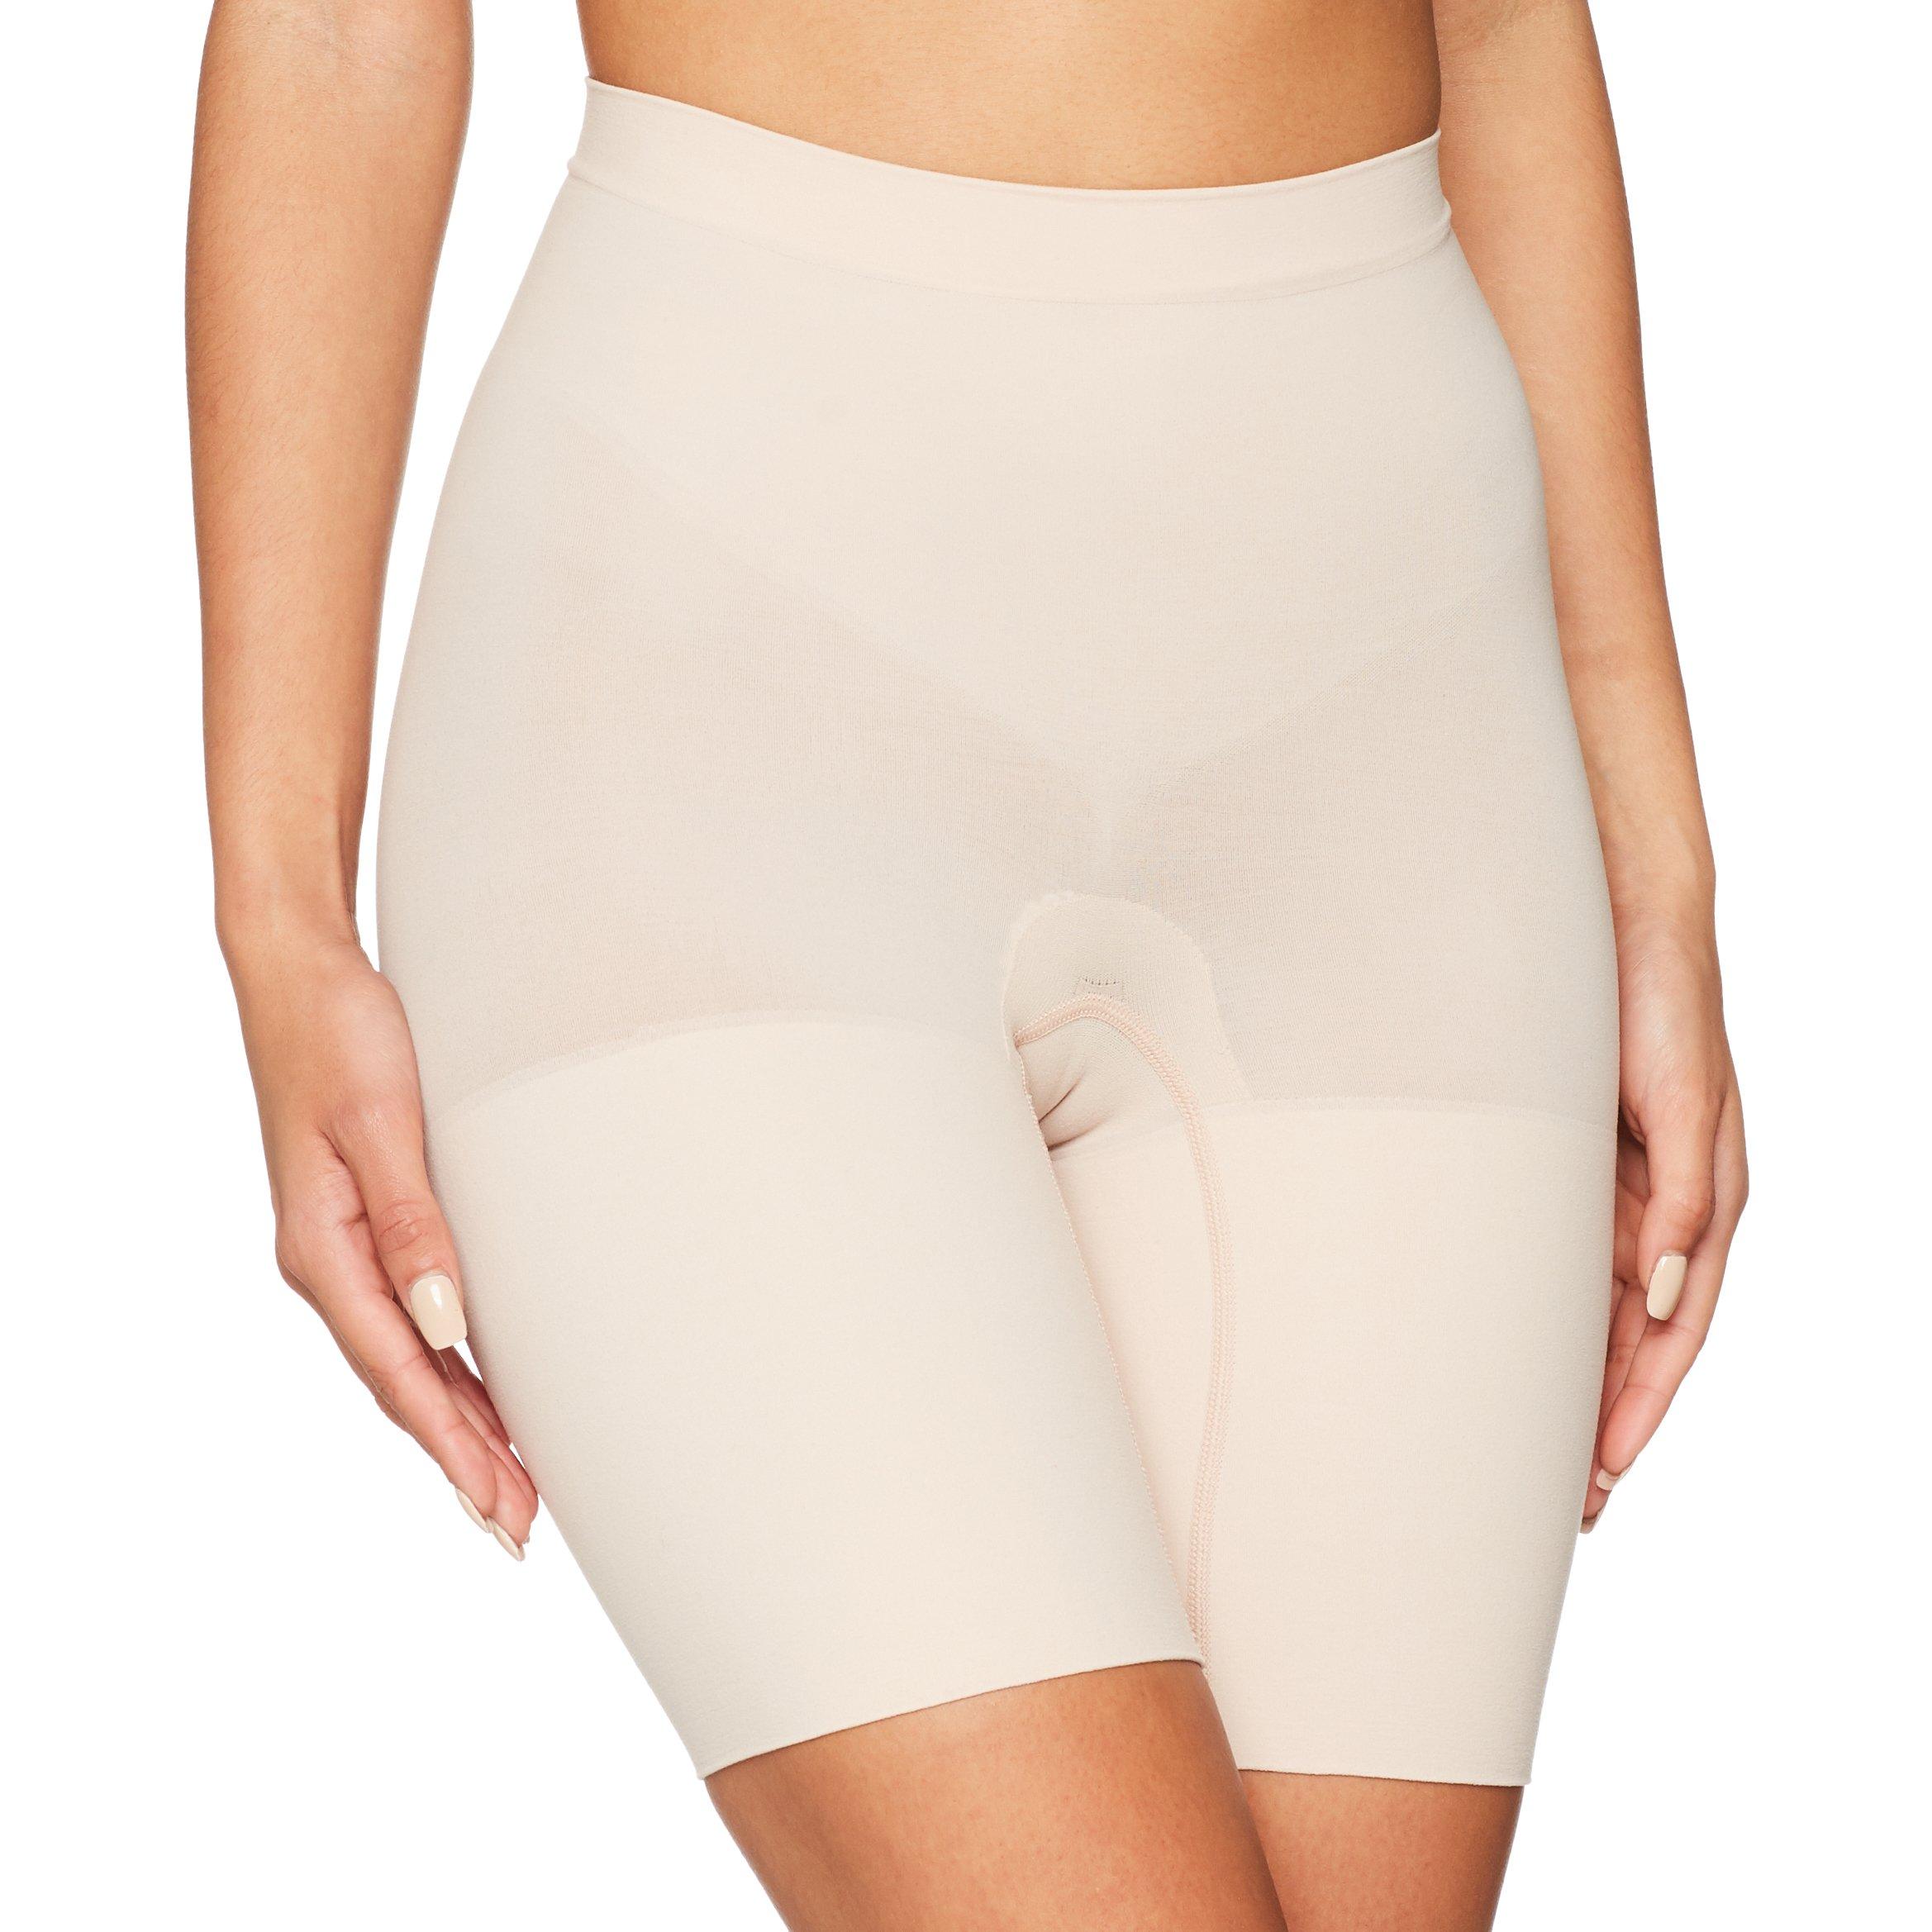 SPANX Power Series Medium Control Shorts, 2X, Soft Nude by SPANX